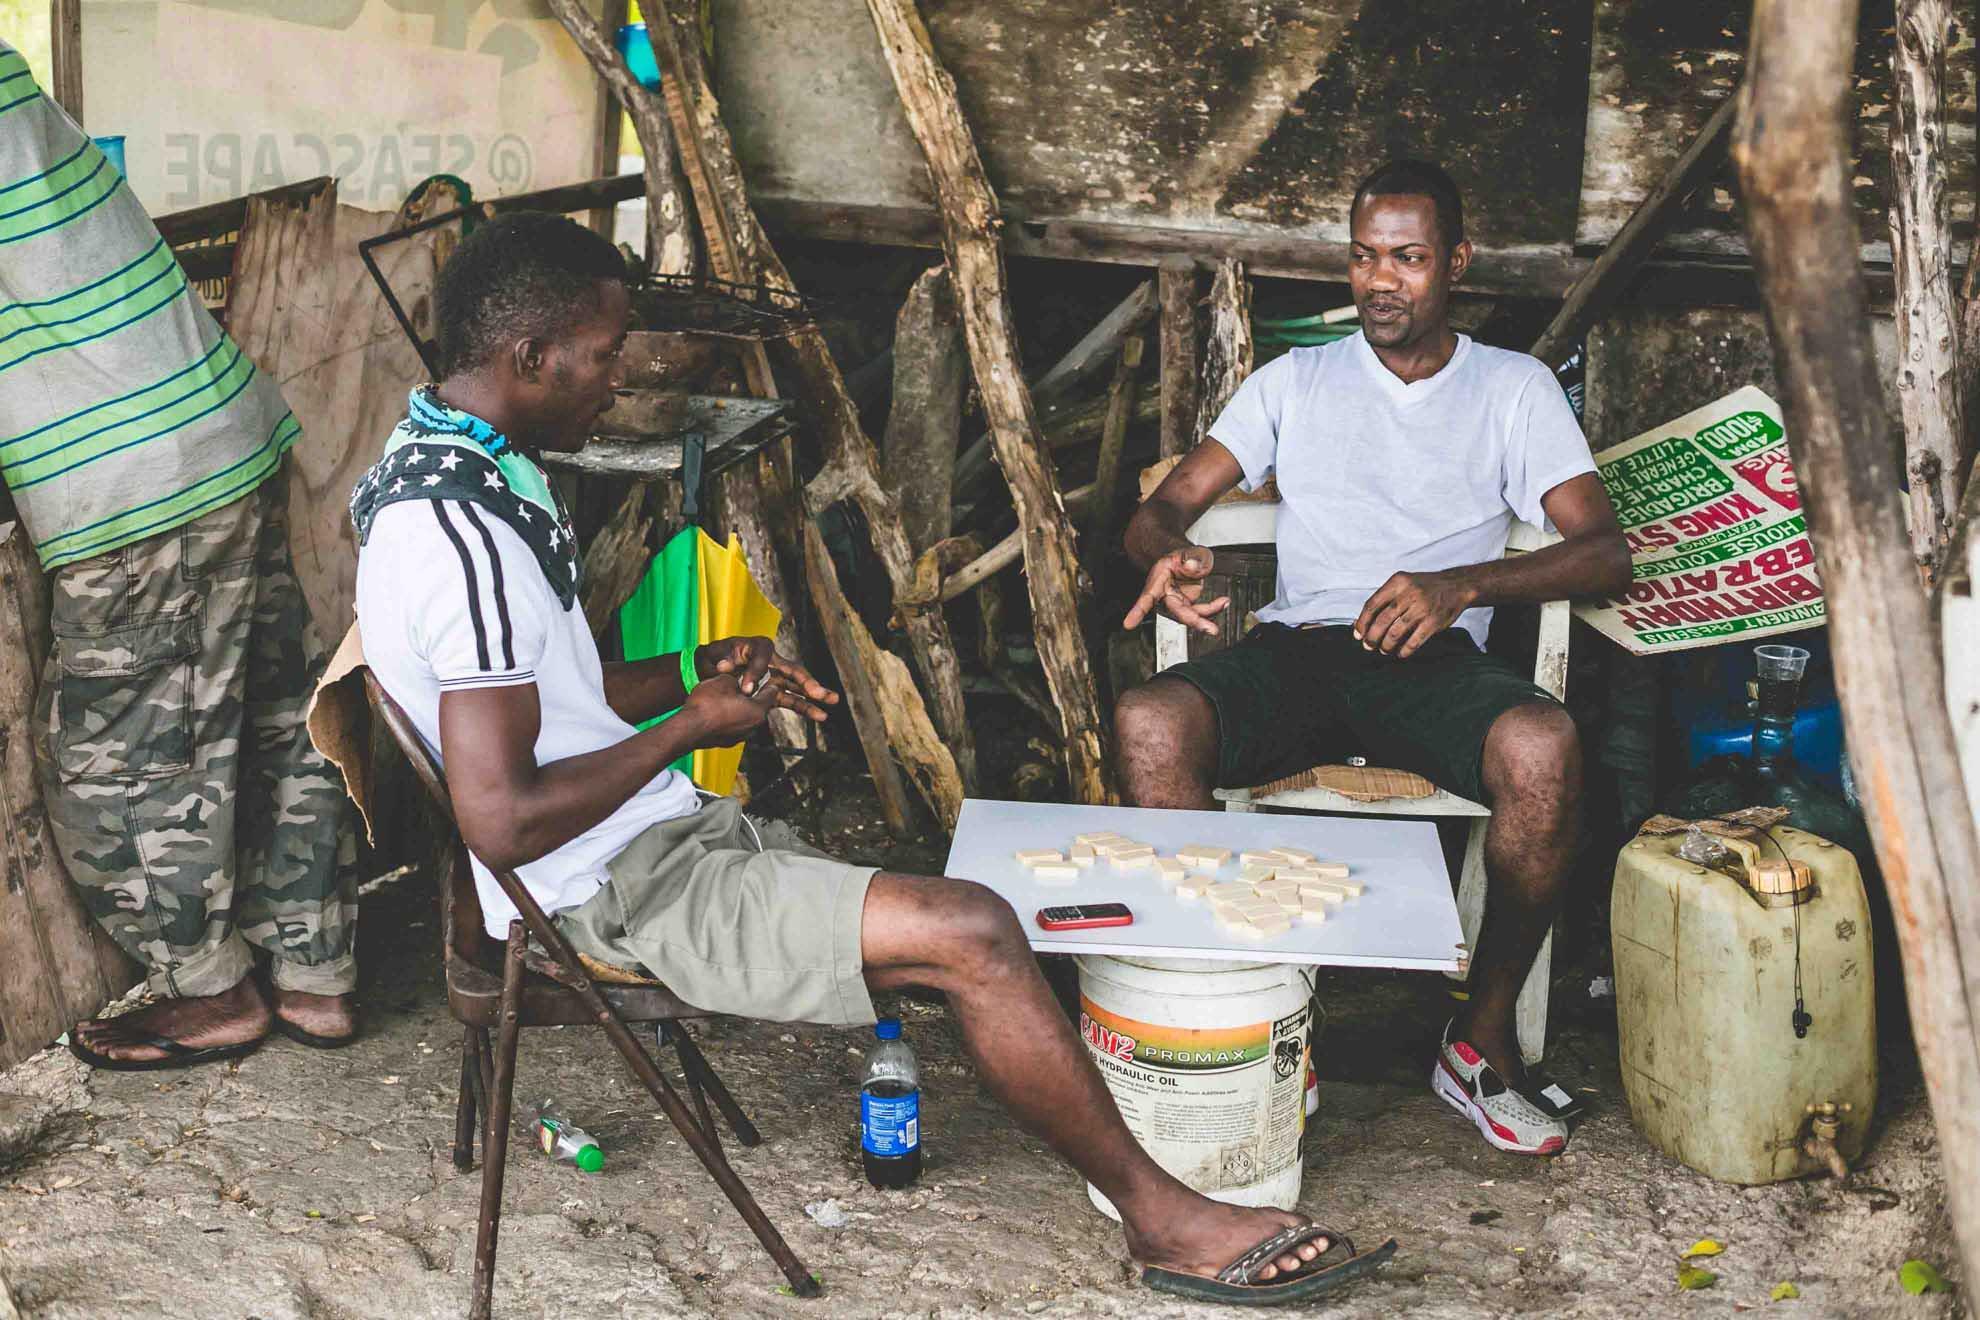 eleven22-missions-jamaica-infirmary-poverty-adam-szarmack-72.jpg